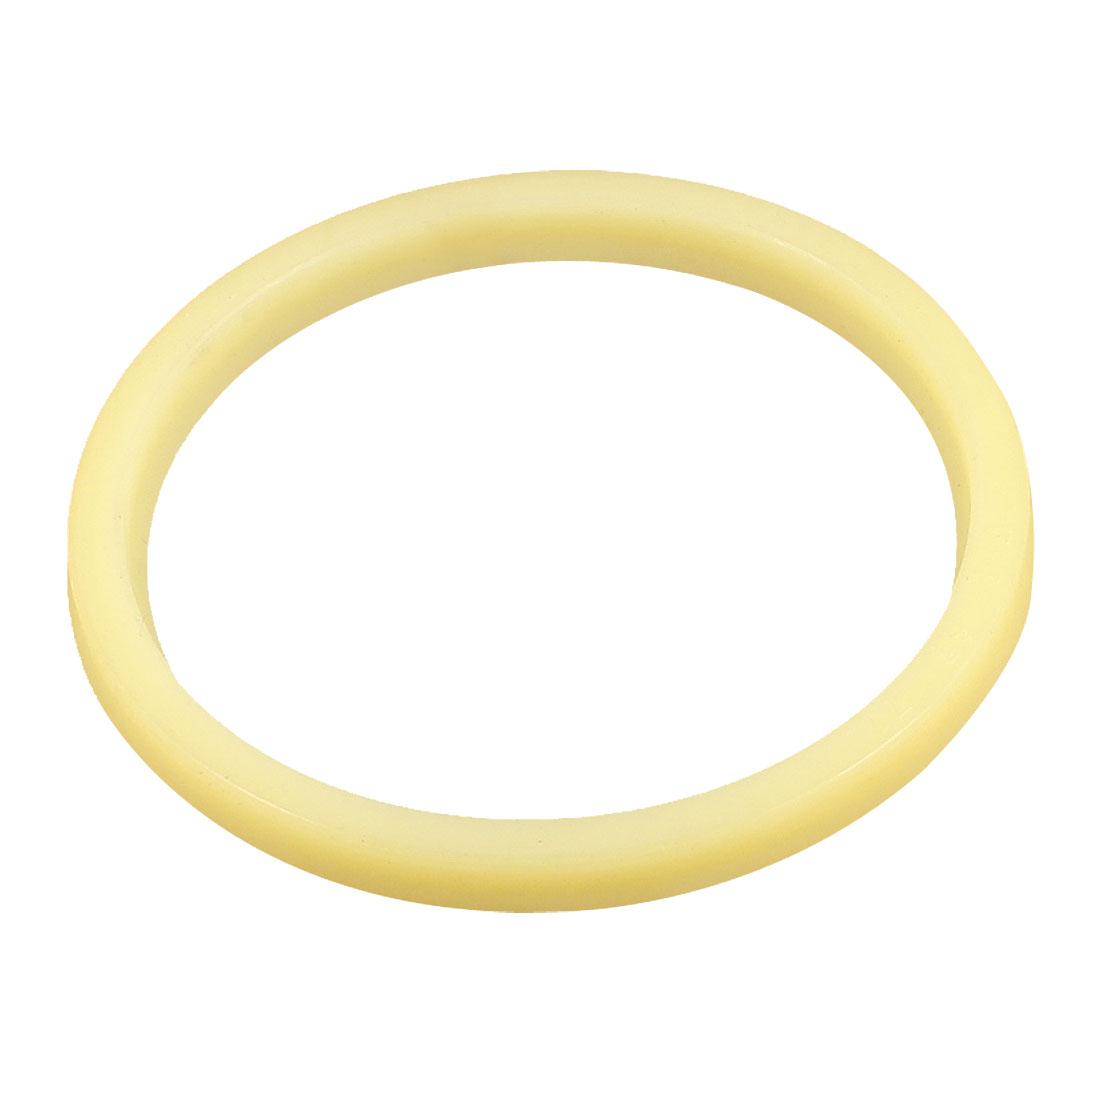 Polyurethane PU 67mm x 77mm x 6mm Sealing Cushion Dust Seal Ring